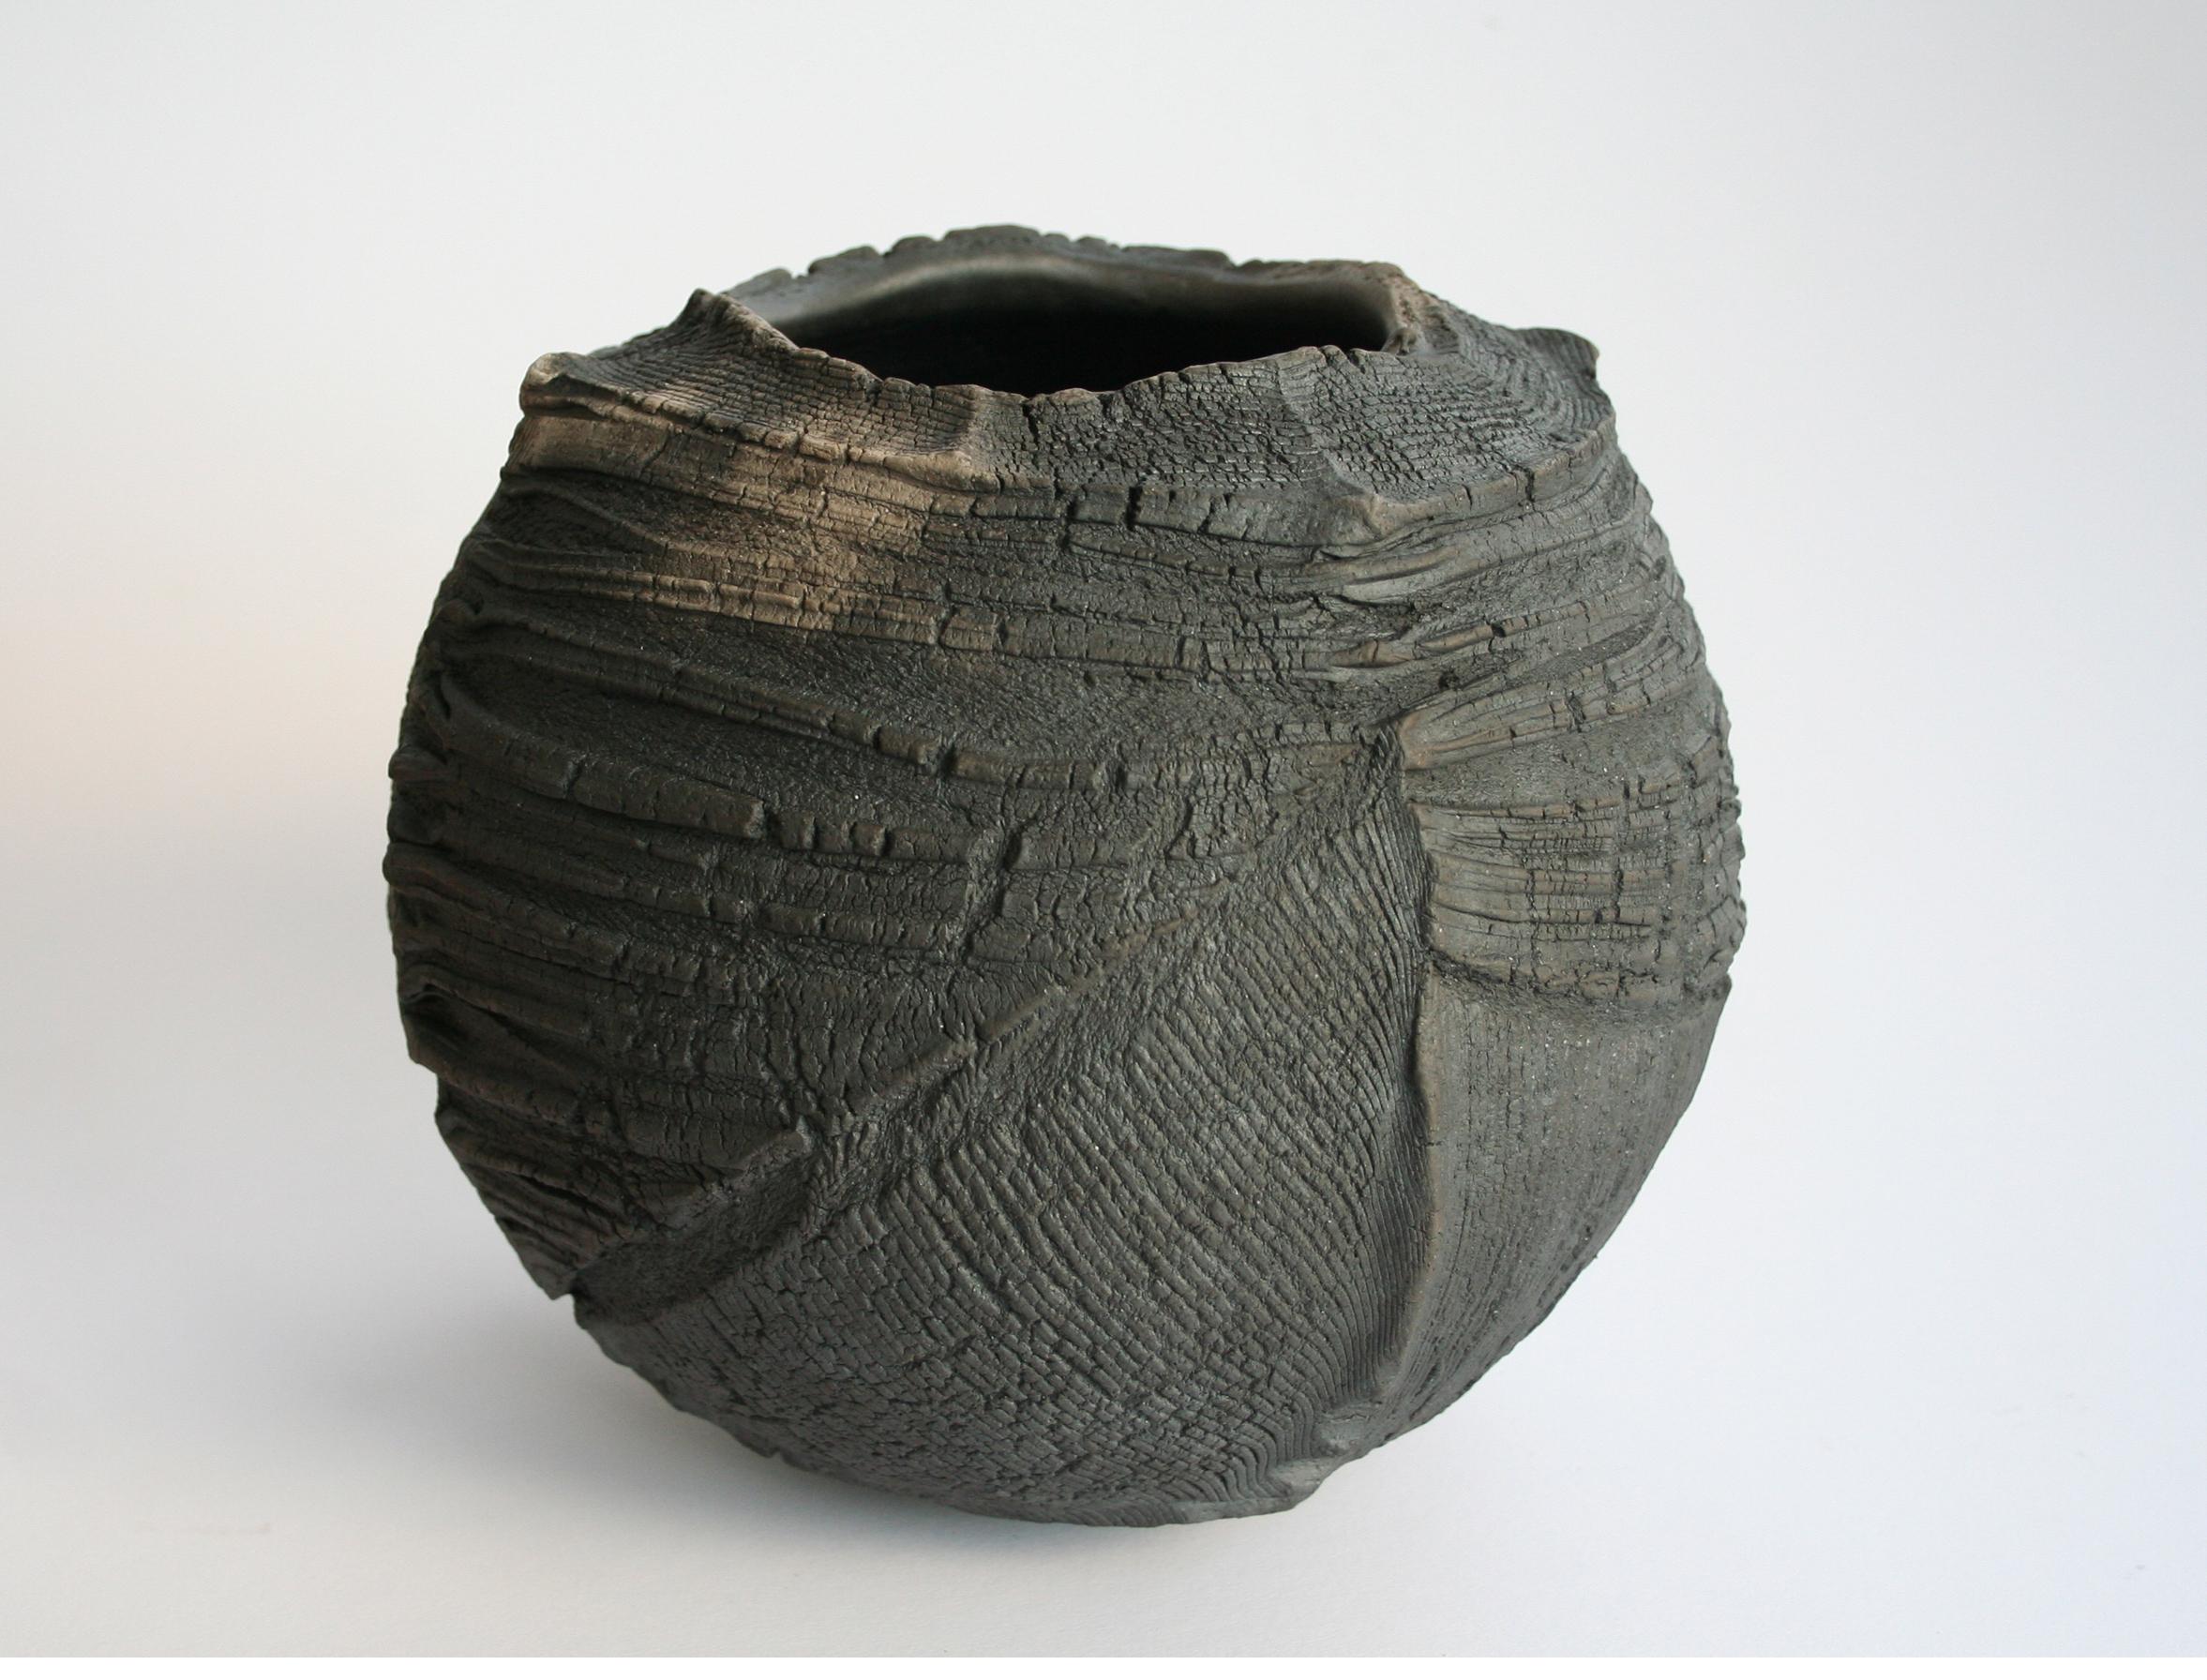 Patricia Shone. Erosion bowl 5 raku ceramic 17x19x19